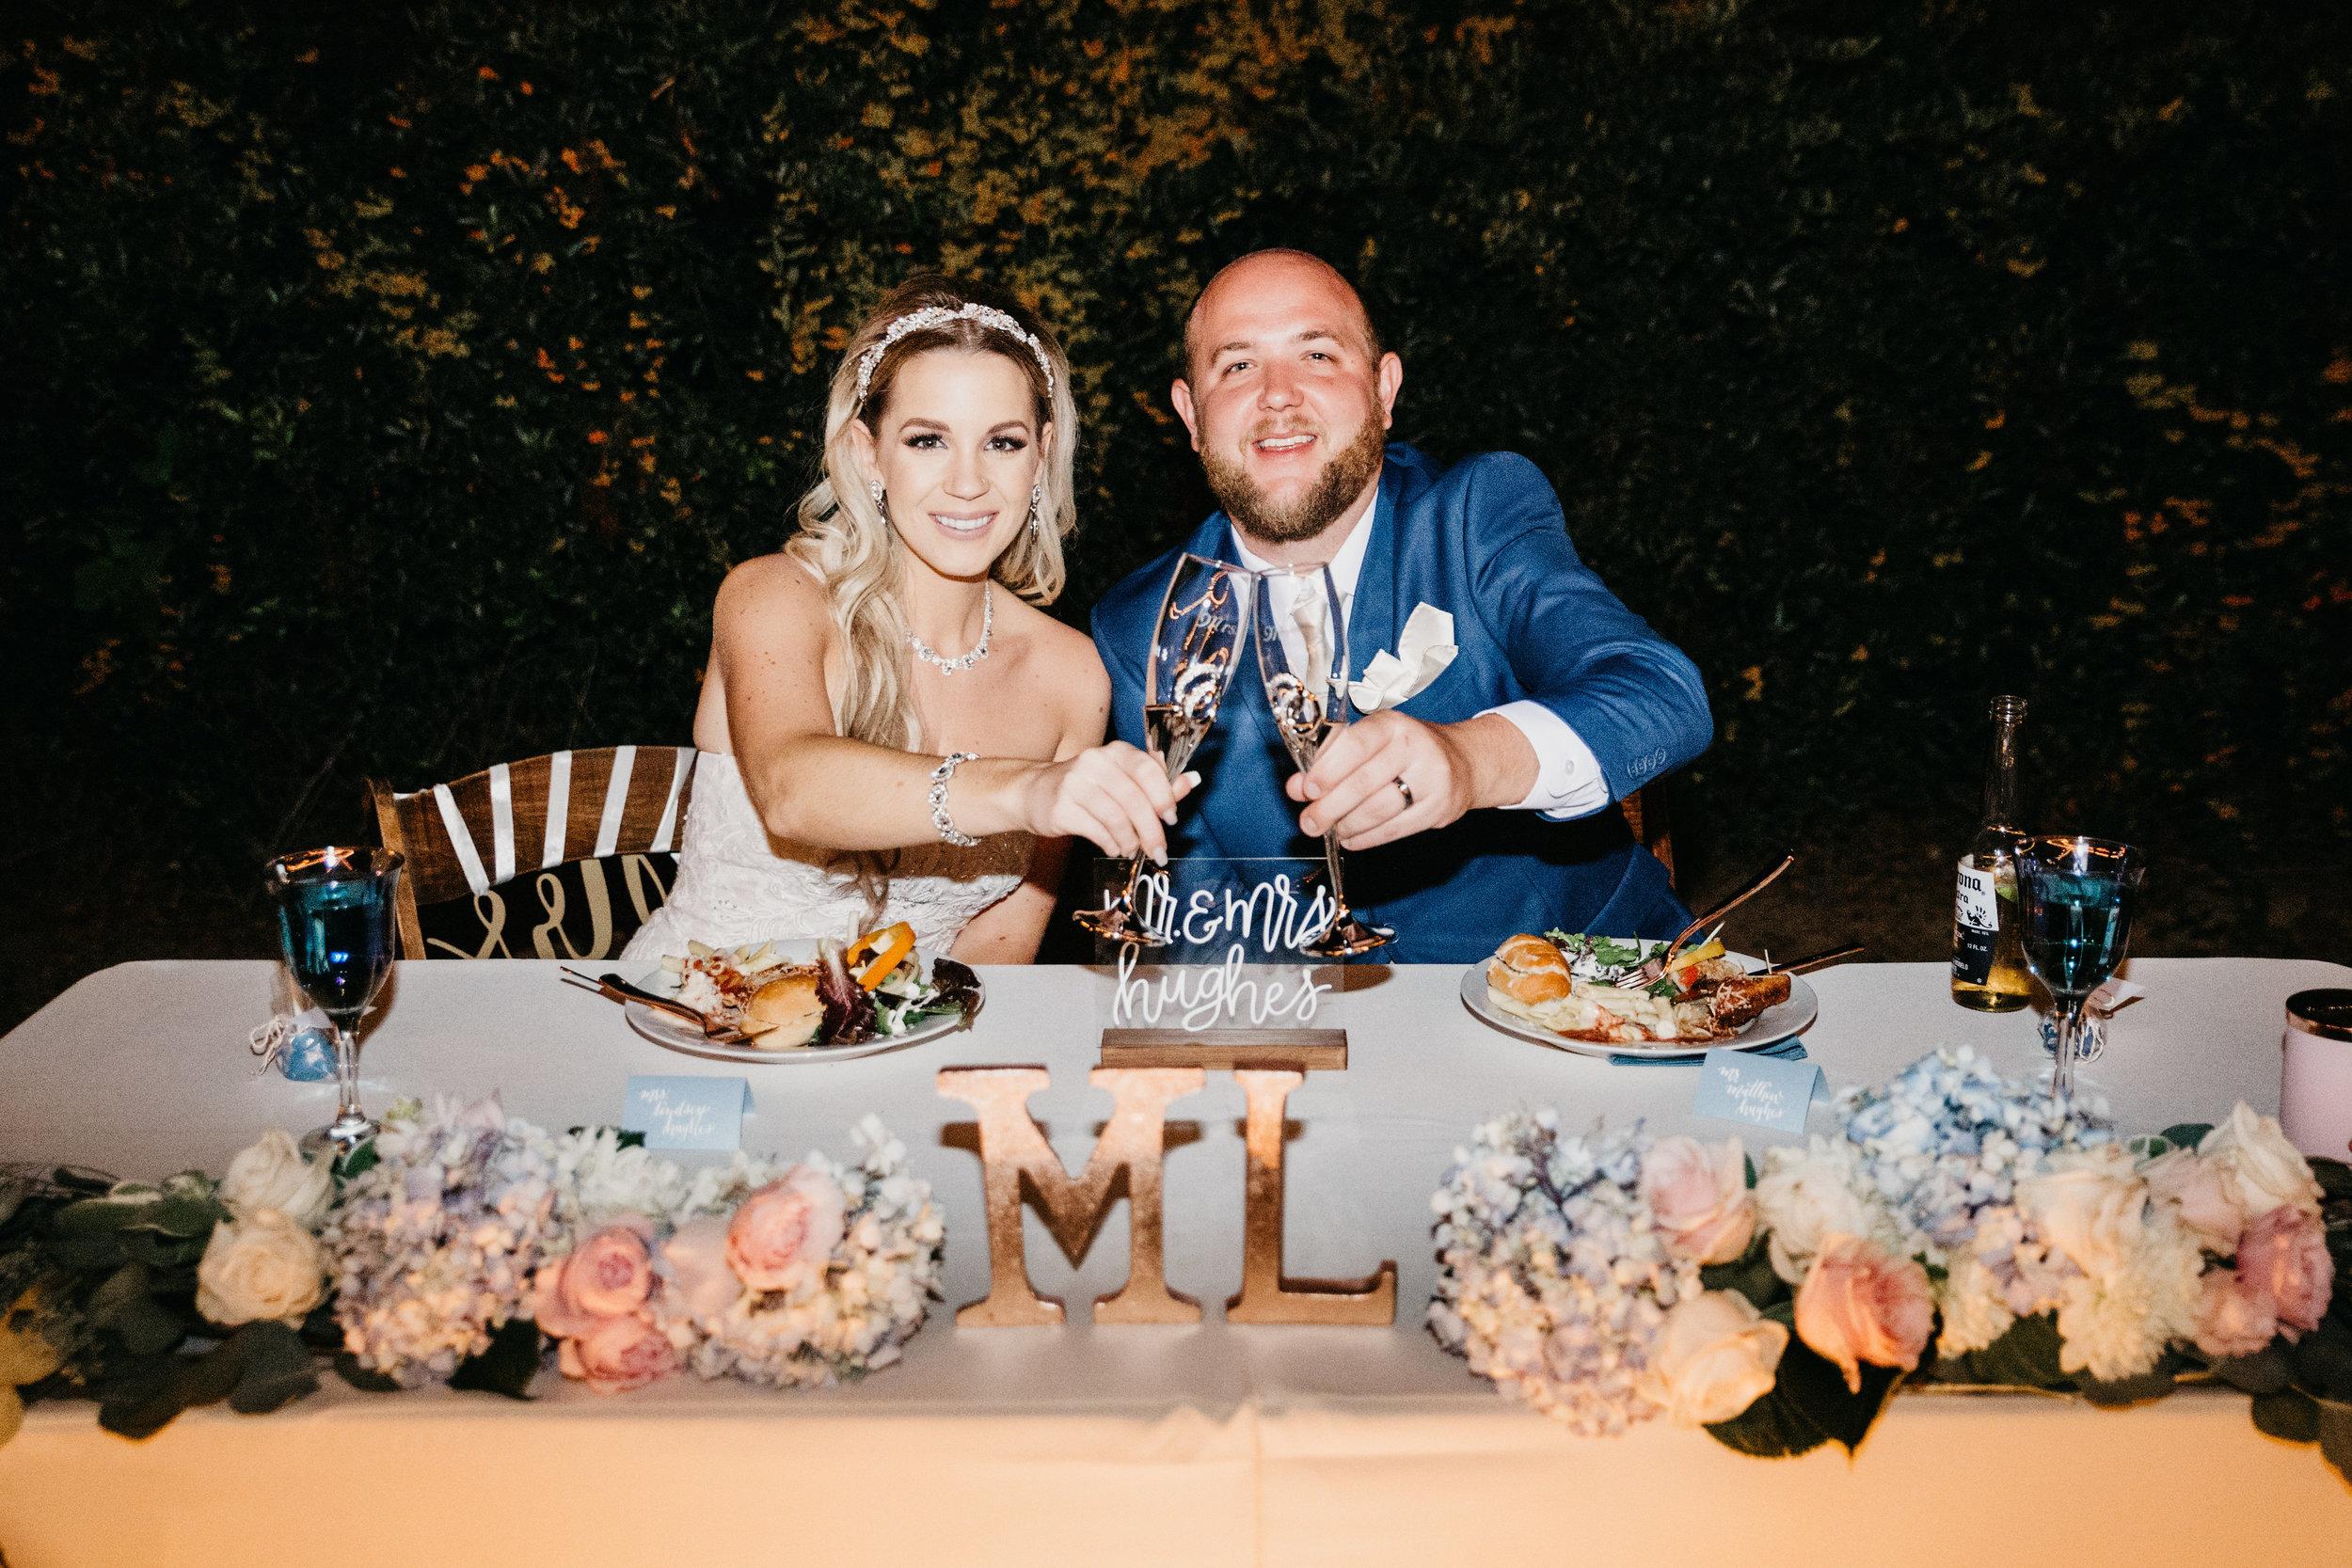 DianaLakePhoto-L+M-San-Diego-Wedding-Reception53.jpg